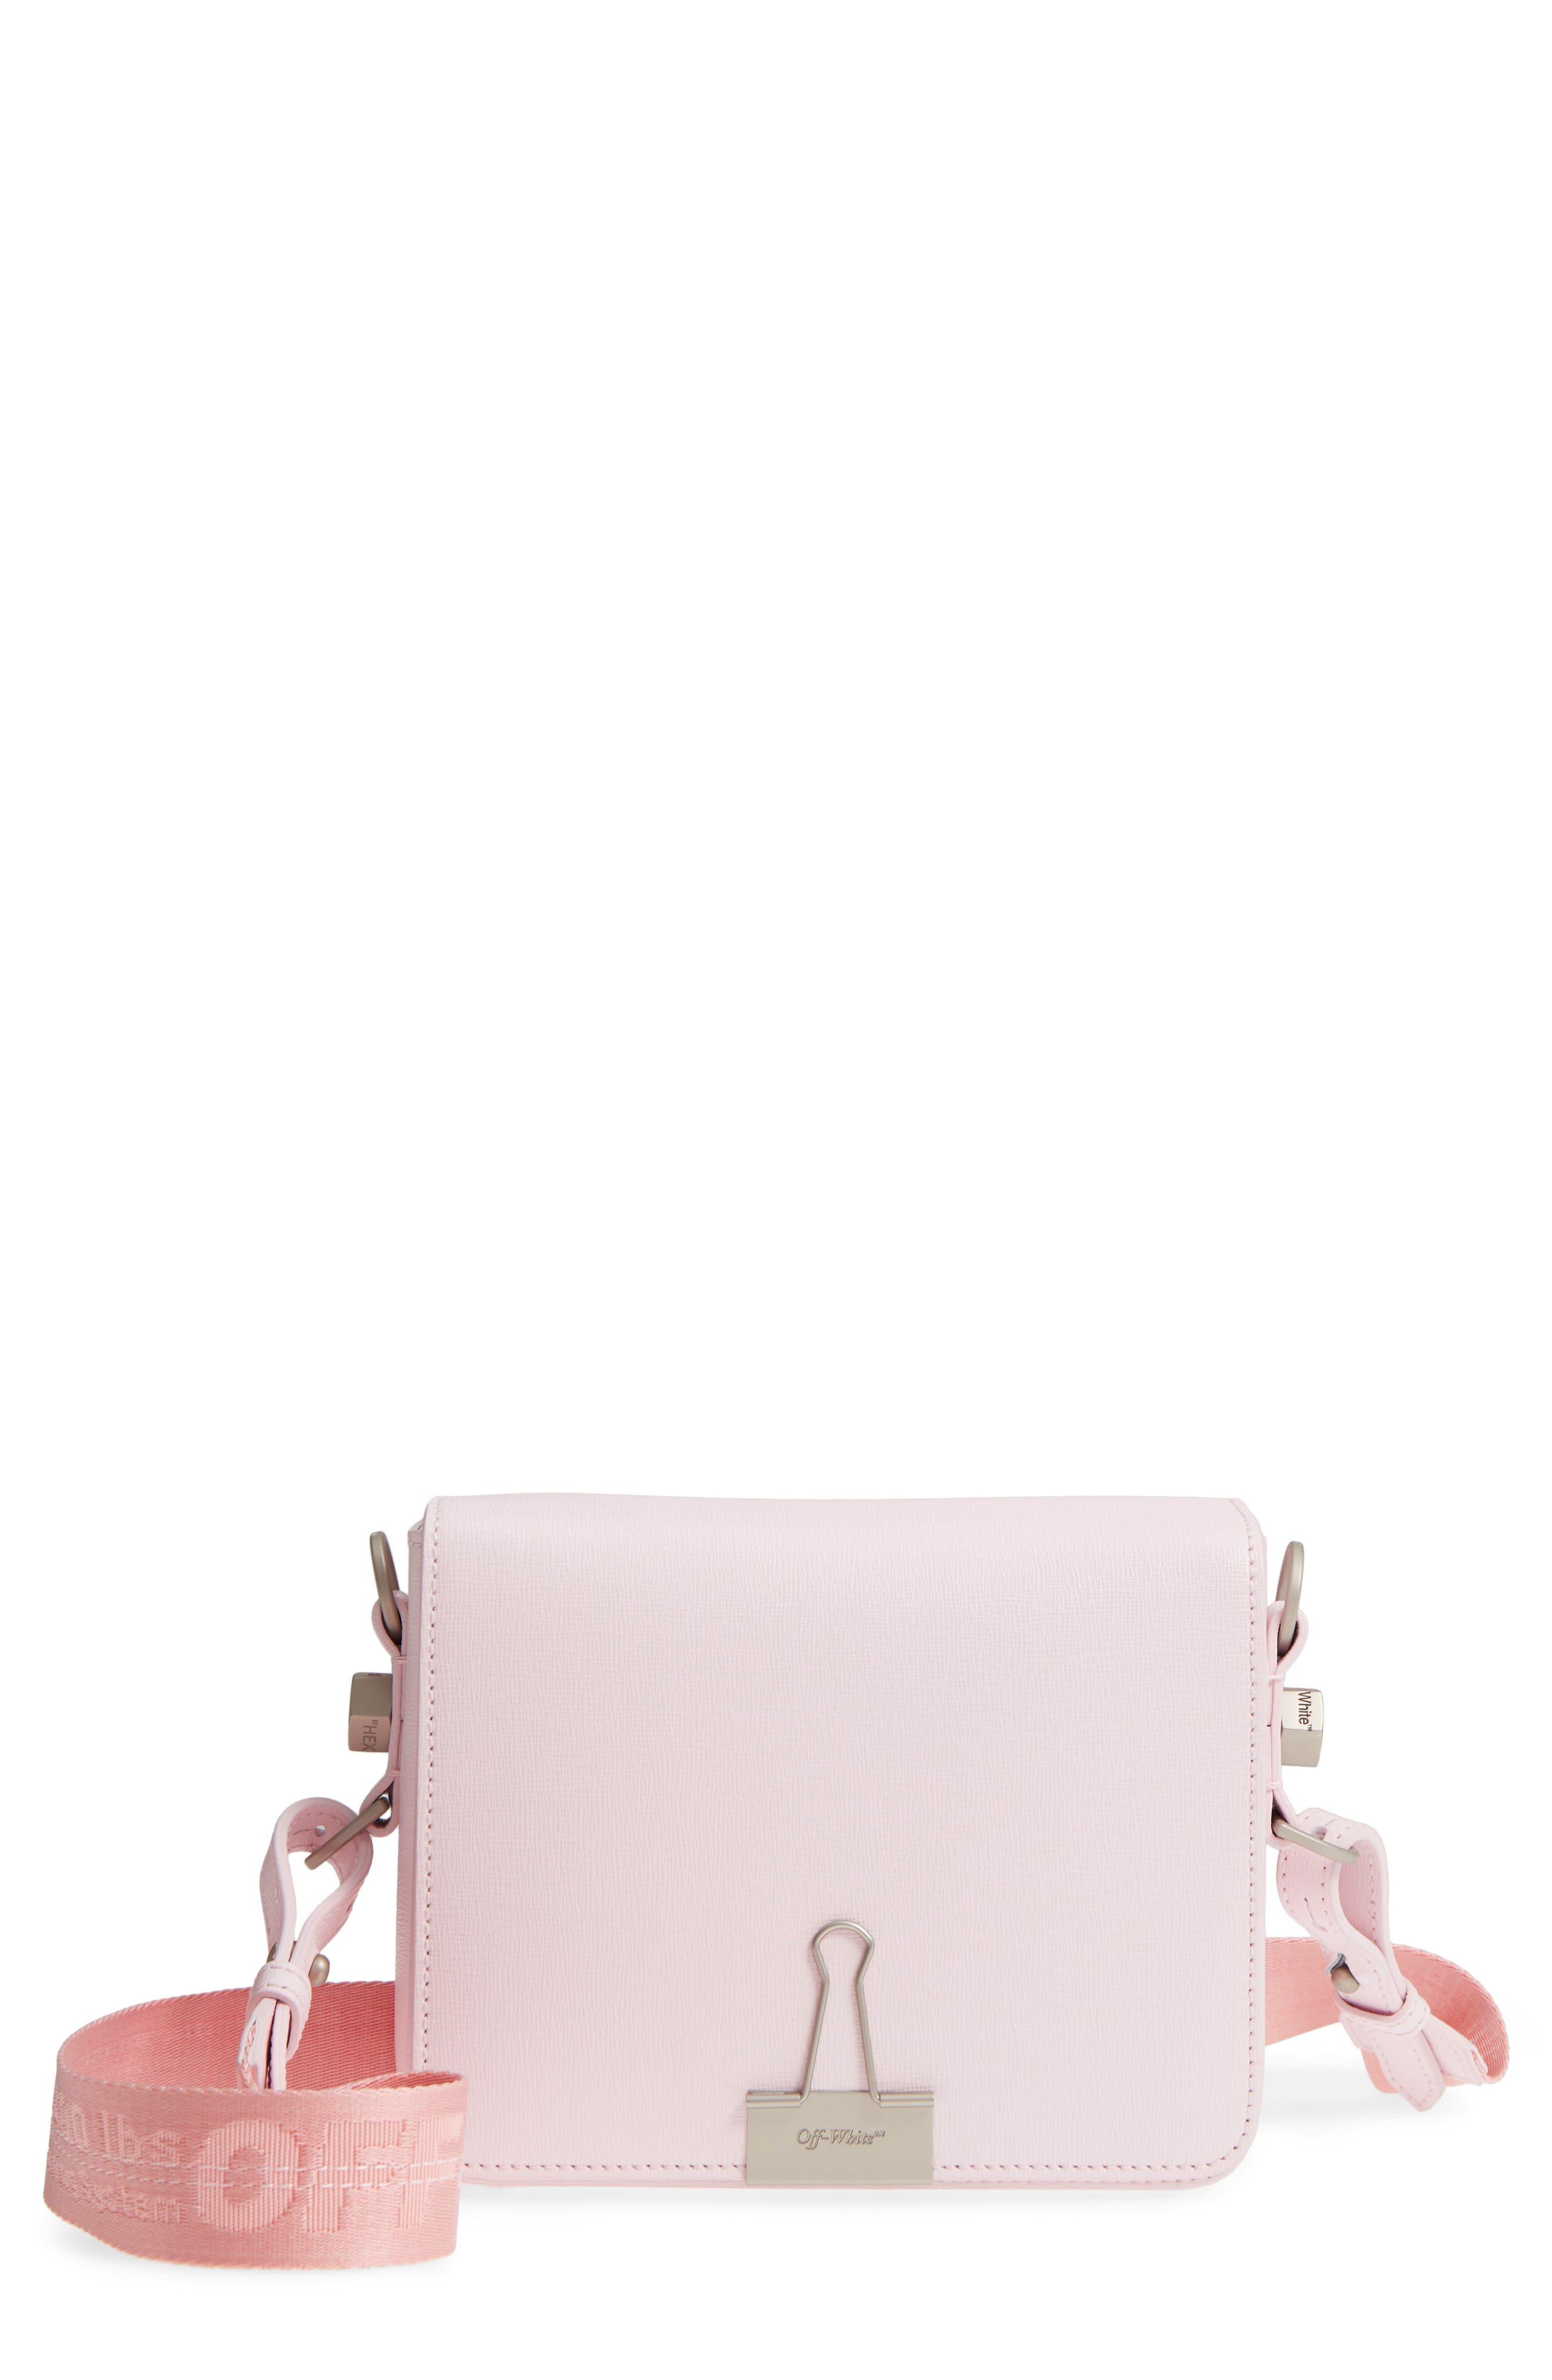 Off-White Binder Clip Leather Flap Bag